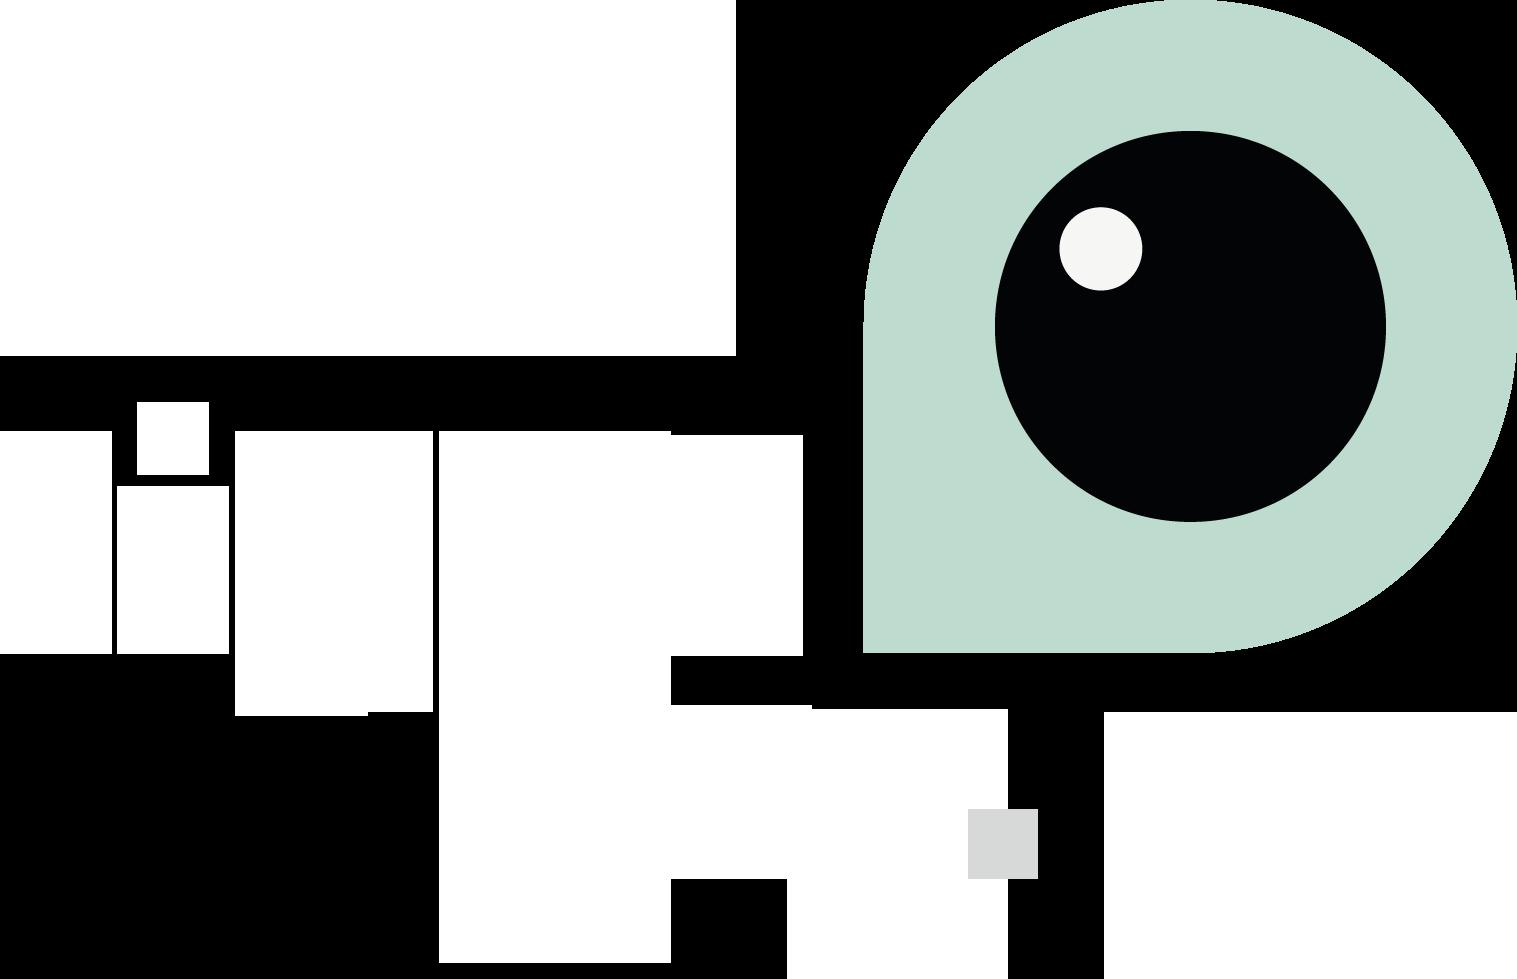 Lightray_logotyp_symbol